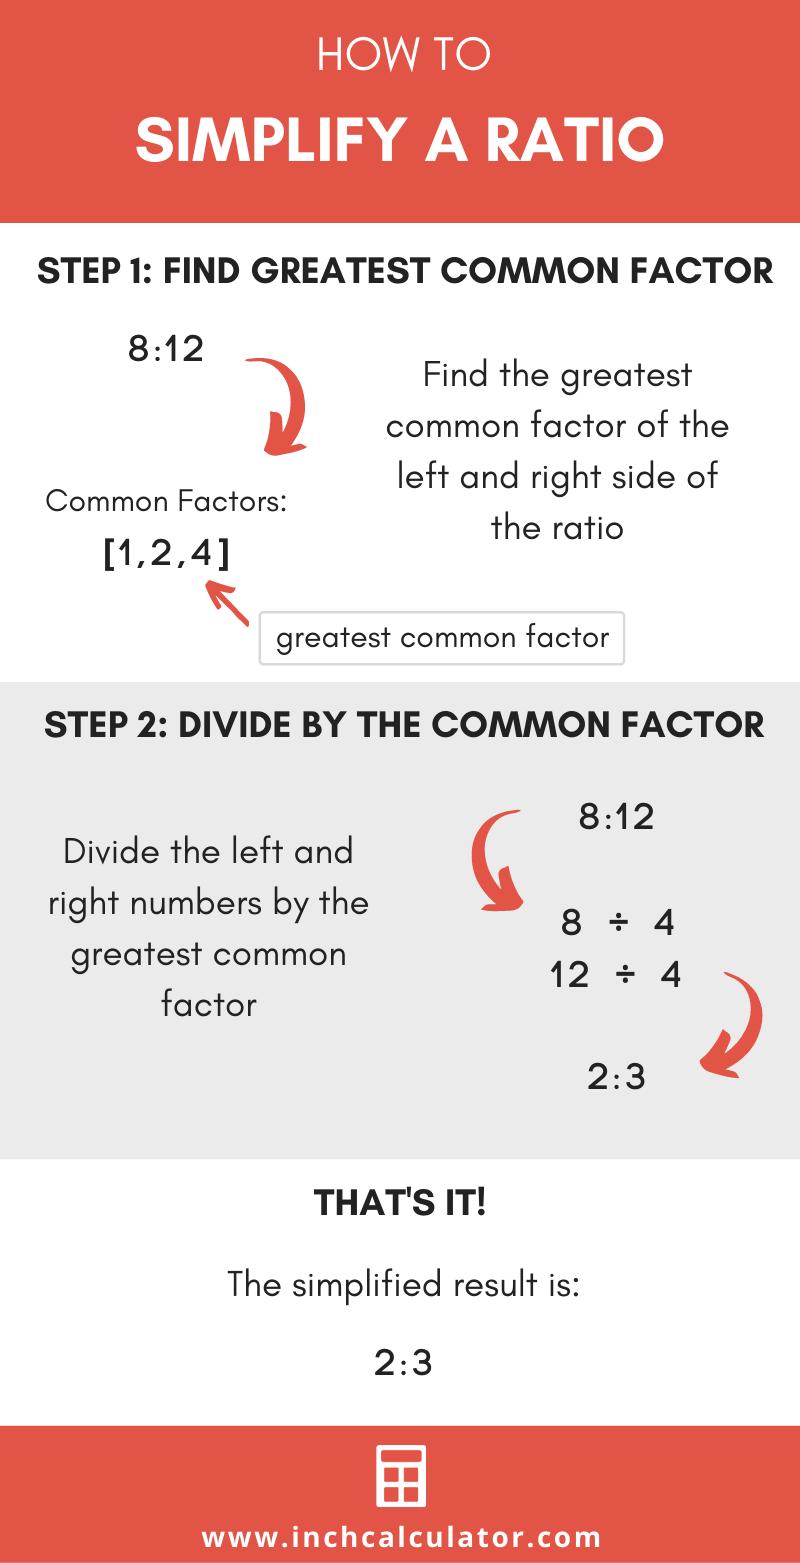 Share ratio simplifier